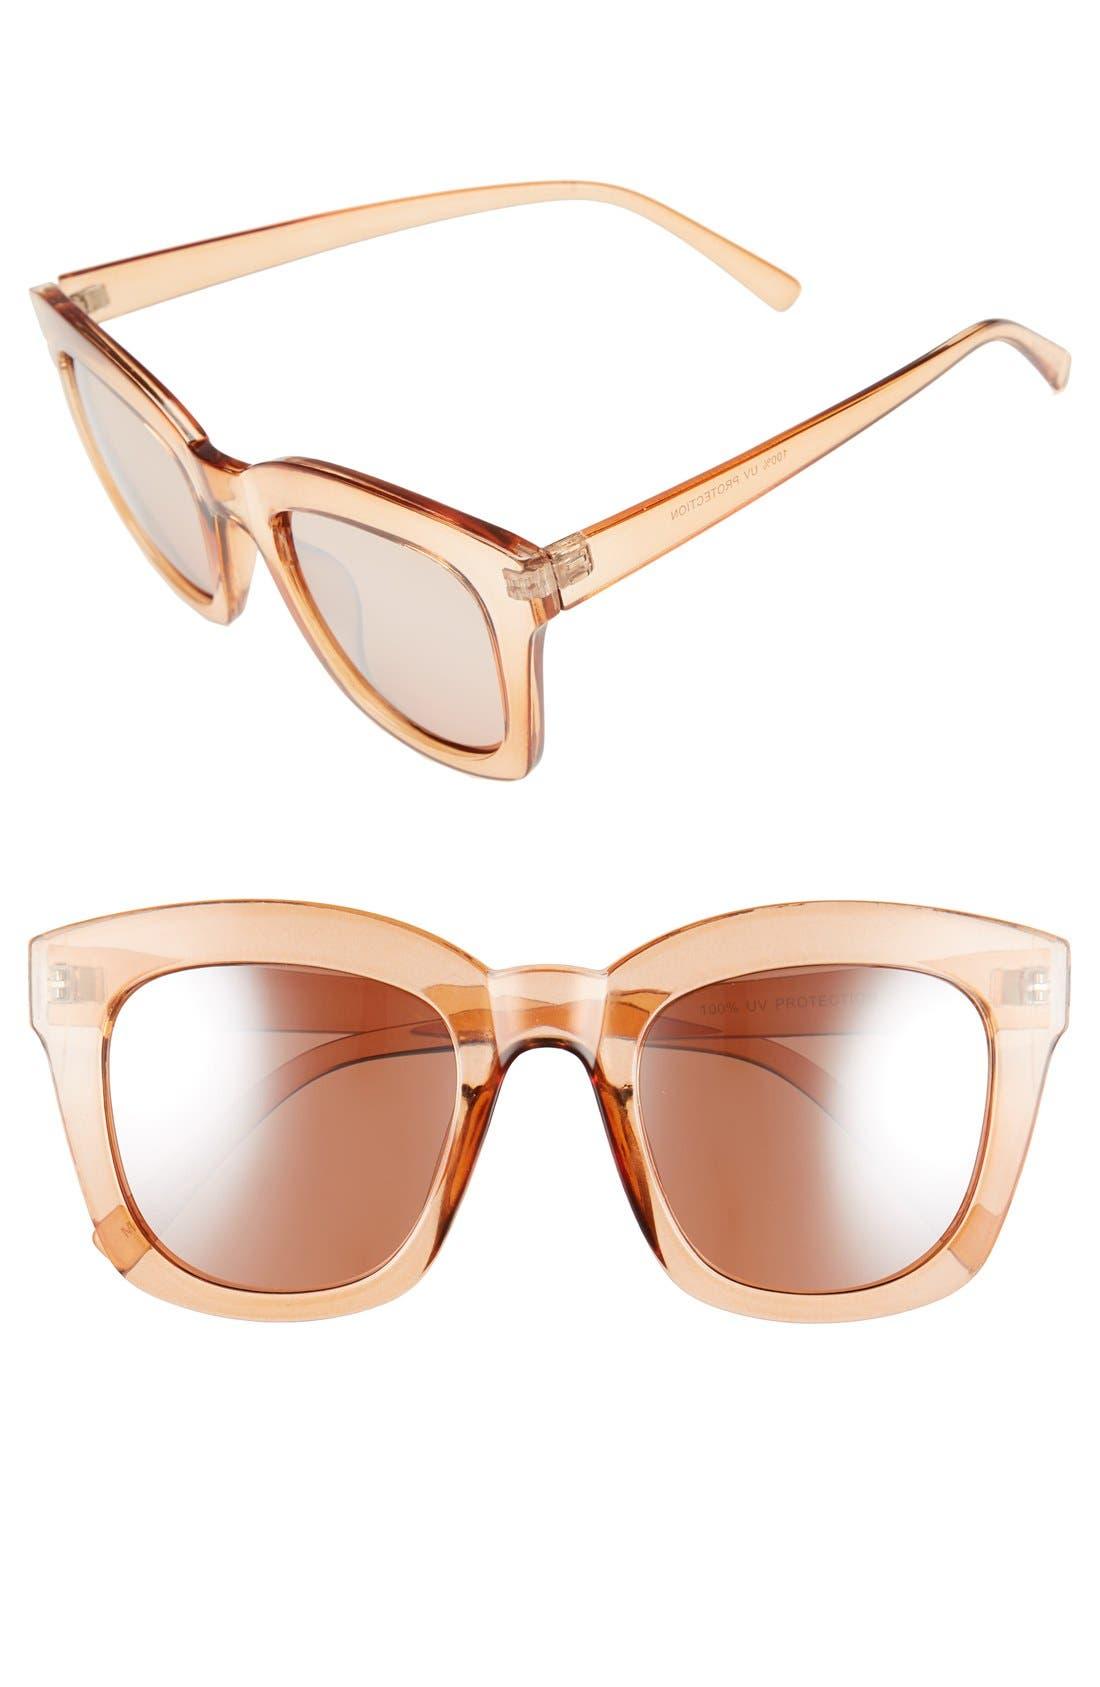 50mm Mirror Square Sunglasses,                         Main,                         color, Rose Gold